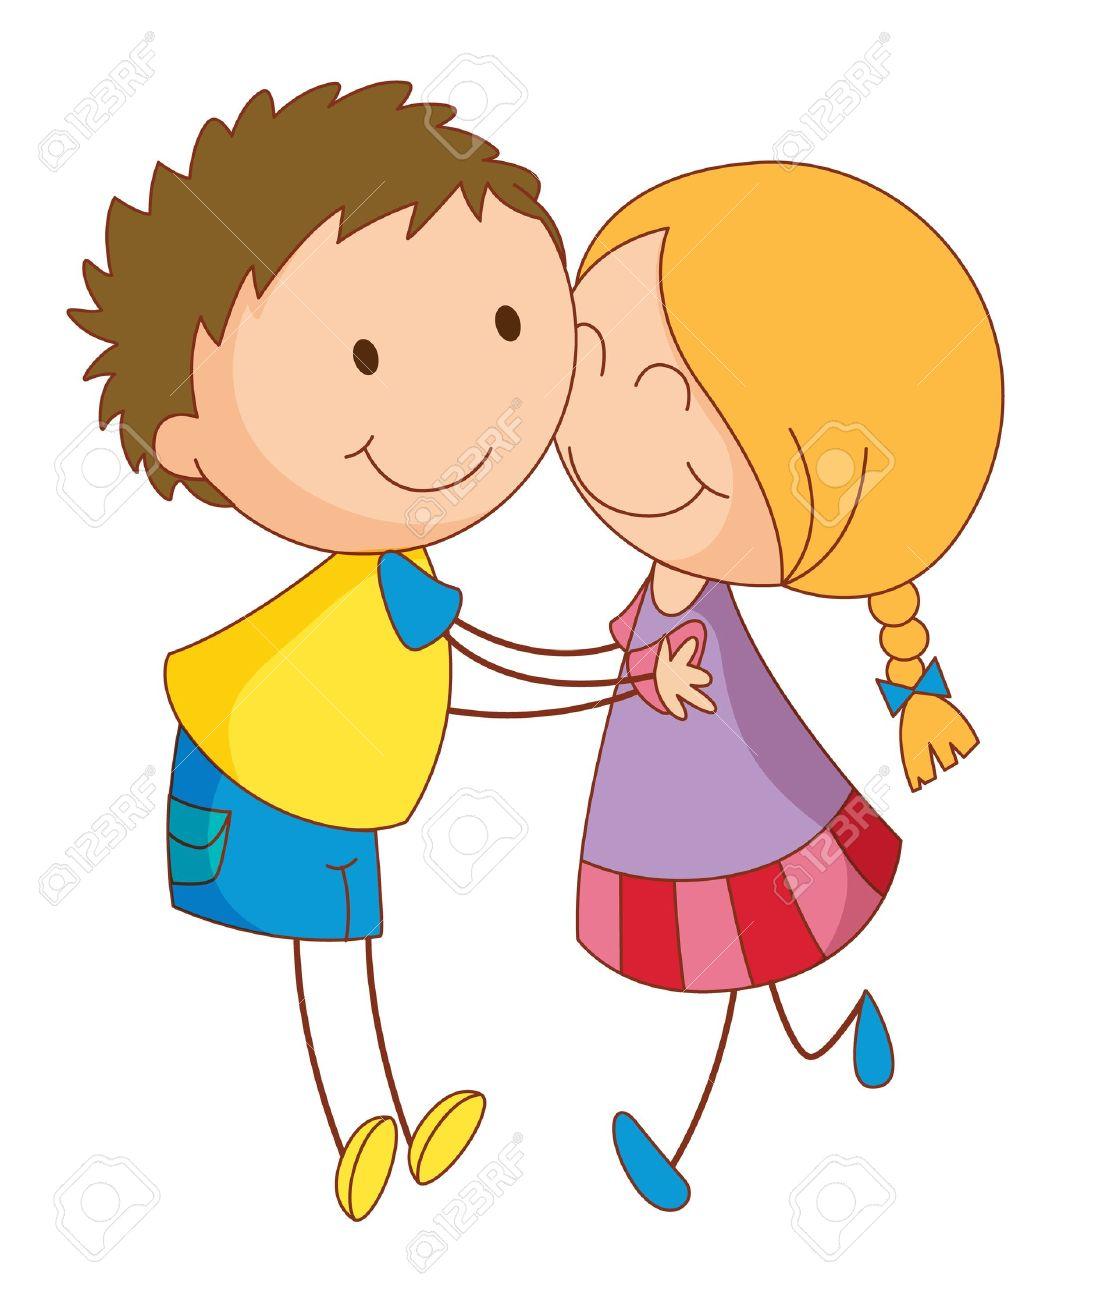 Images cartoons free download. Hugging clipart hug hand